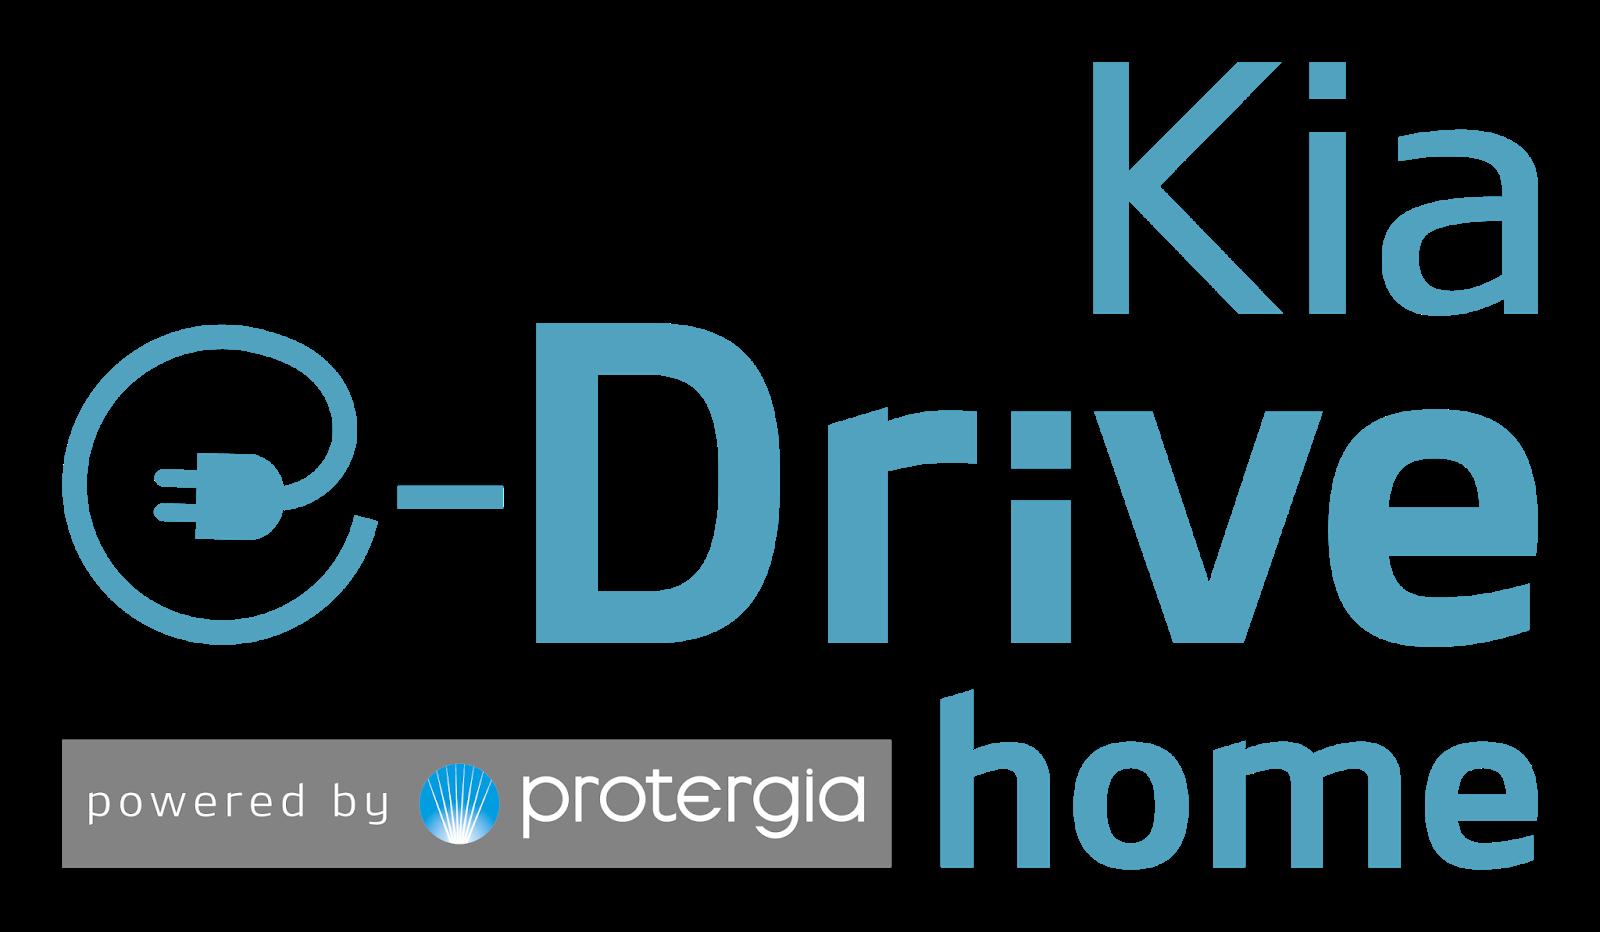 logo2Bkia2Bprotergia Συνεργασία Kia & Protergia, για τα ηλεκτρικά αυτοκίνητα